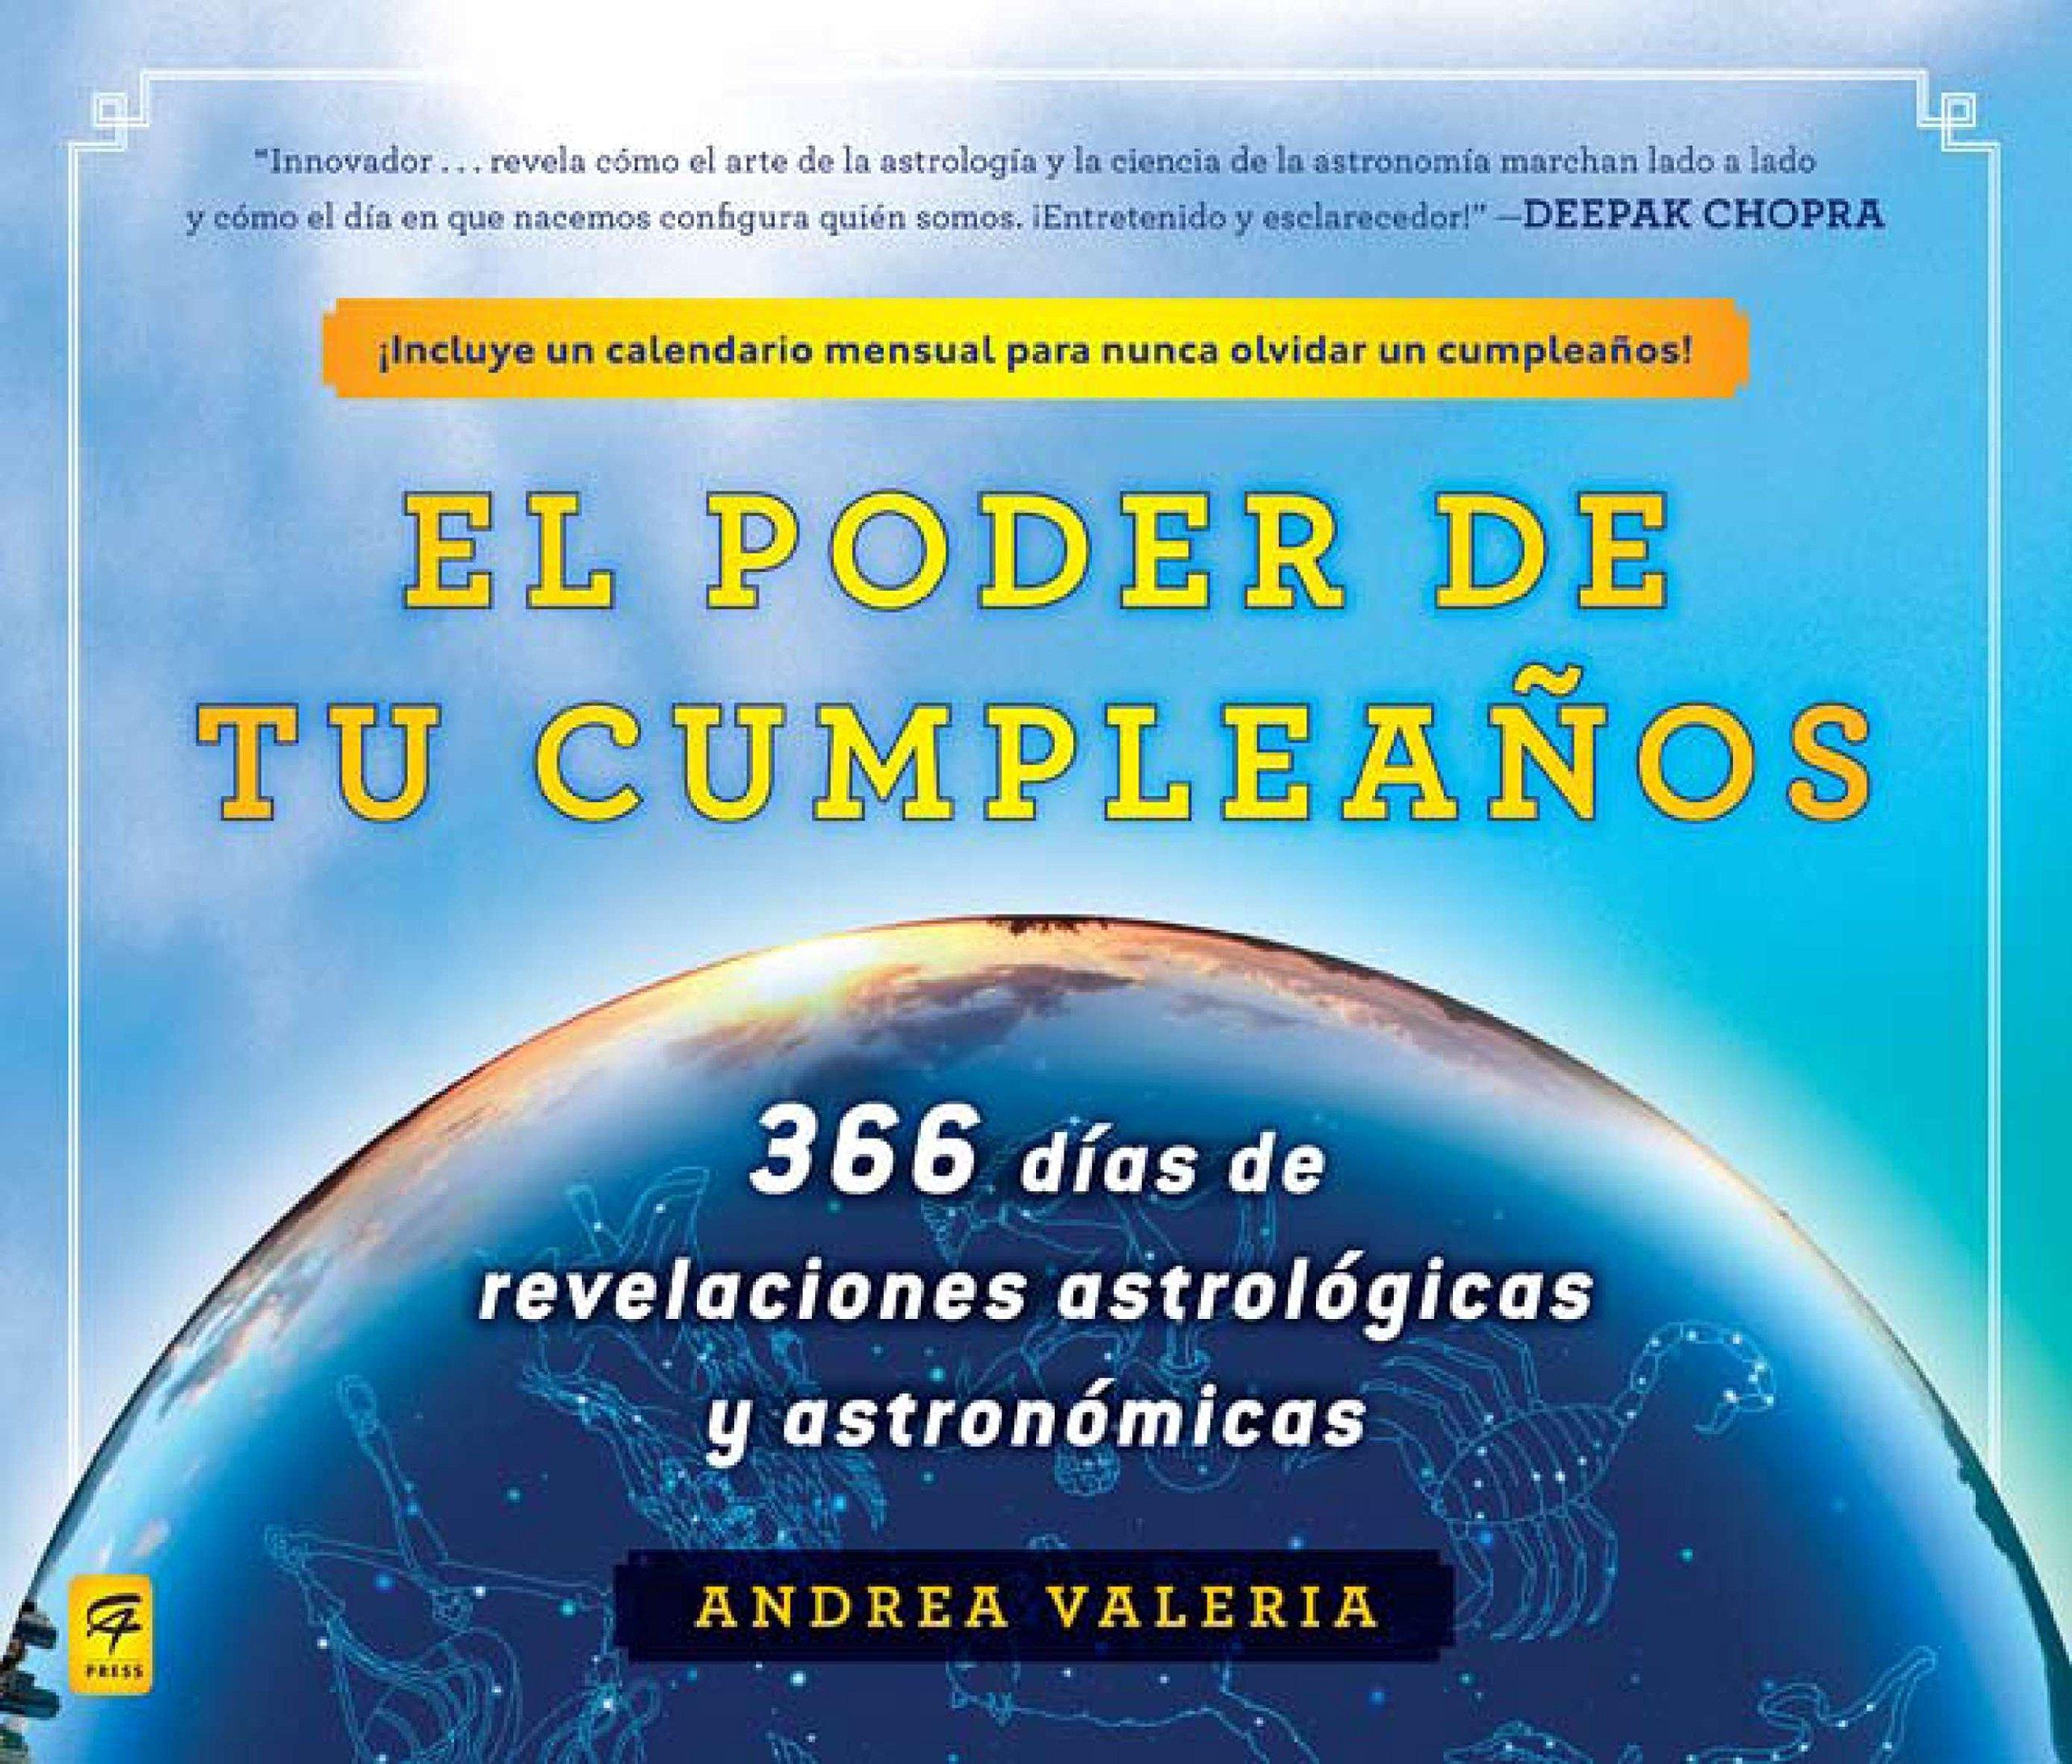 Read Online El poder de tu cumpleaños (The Power of Your Birthday): 366 dias de revelaciones astrologicas y astronomicas (366 Days of Astrological a nd Astronomical Revelations) (Spanish Edition) PDF